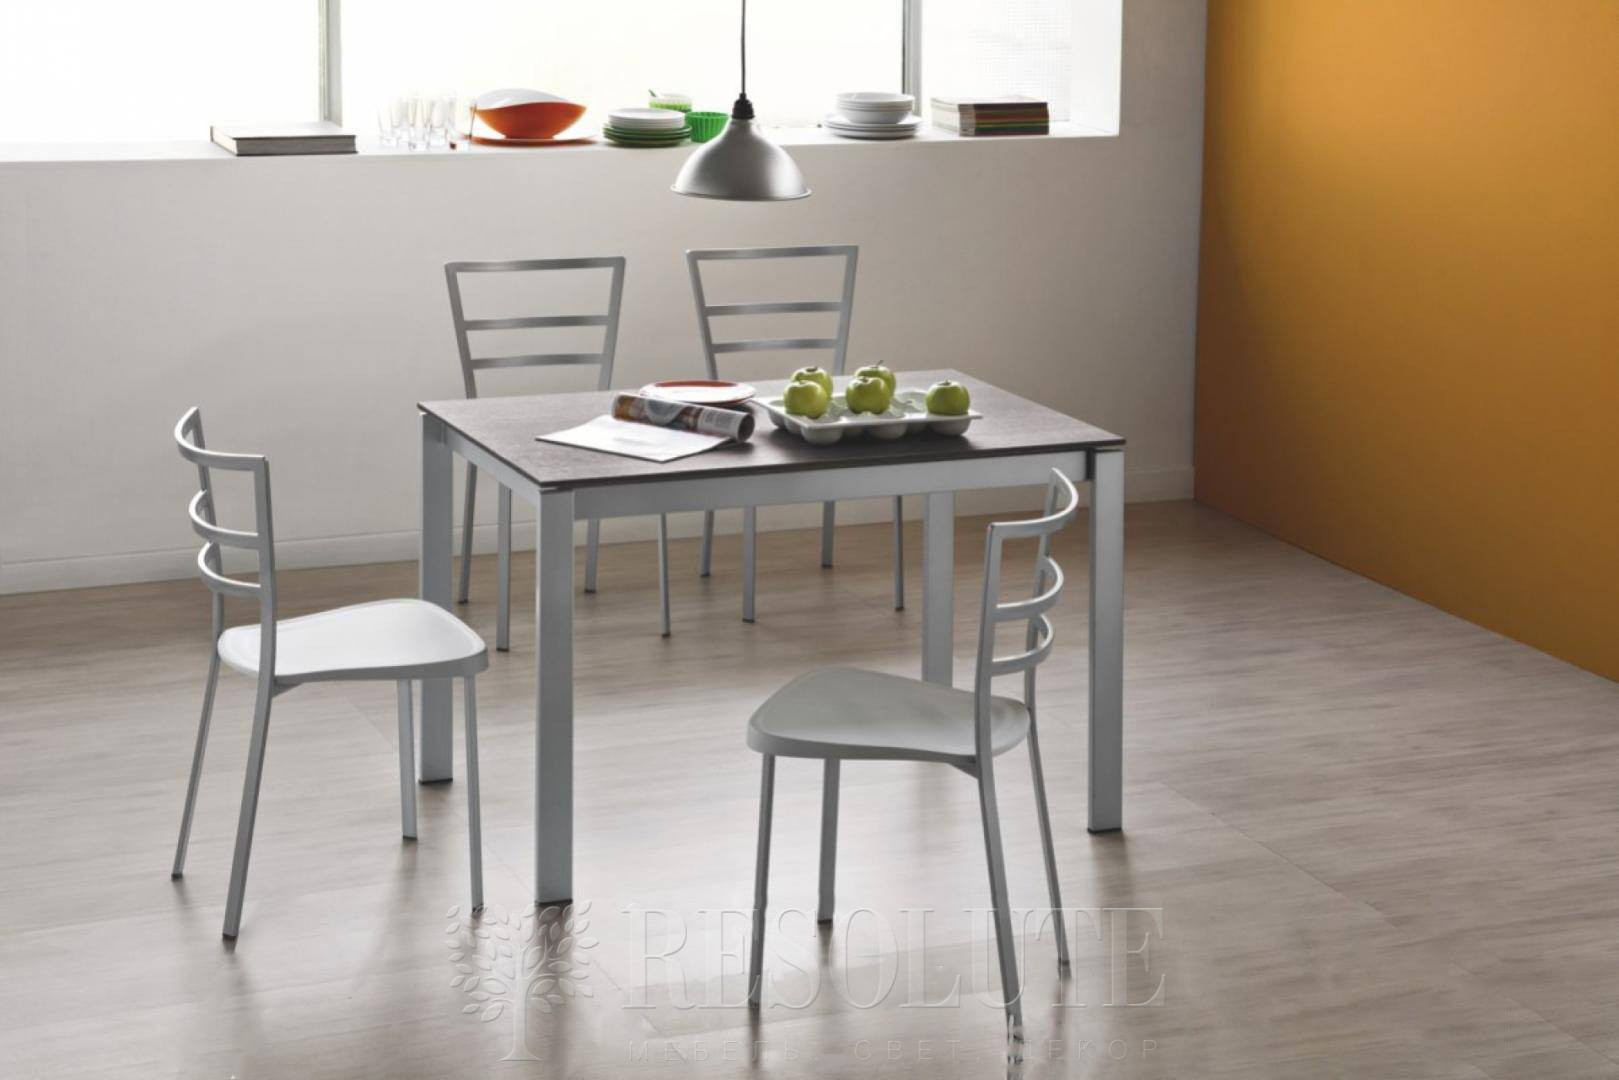 Стол металлический Olivo&Godeassi G/4757 L130 Blog - 1